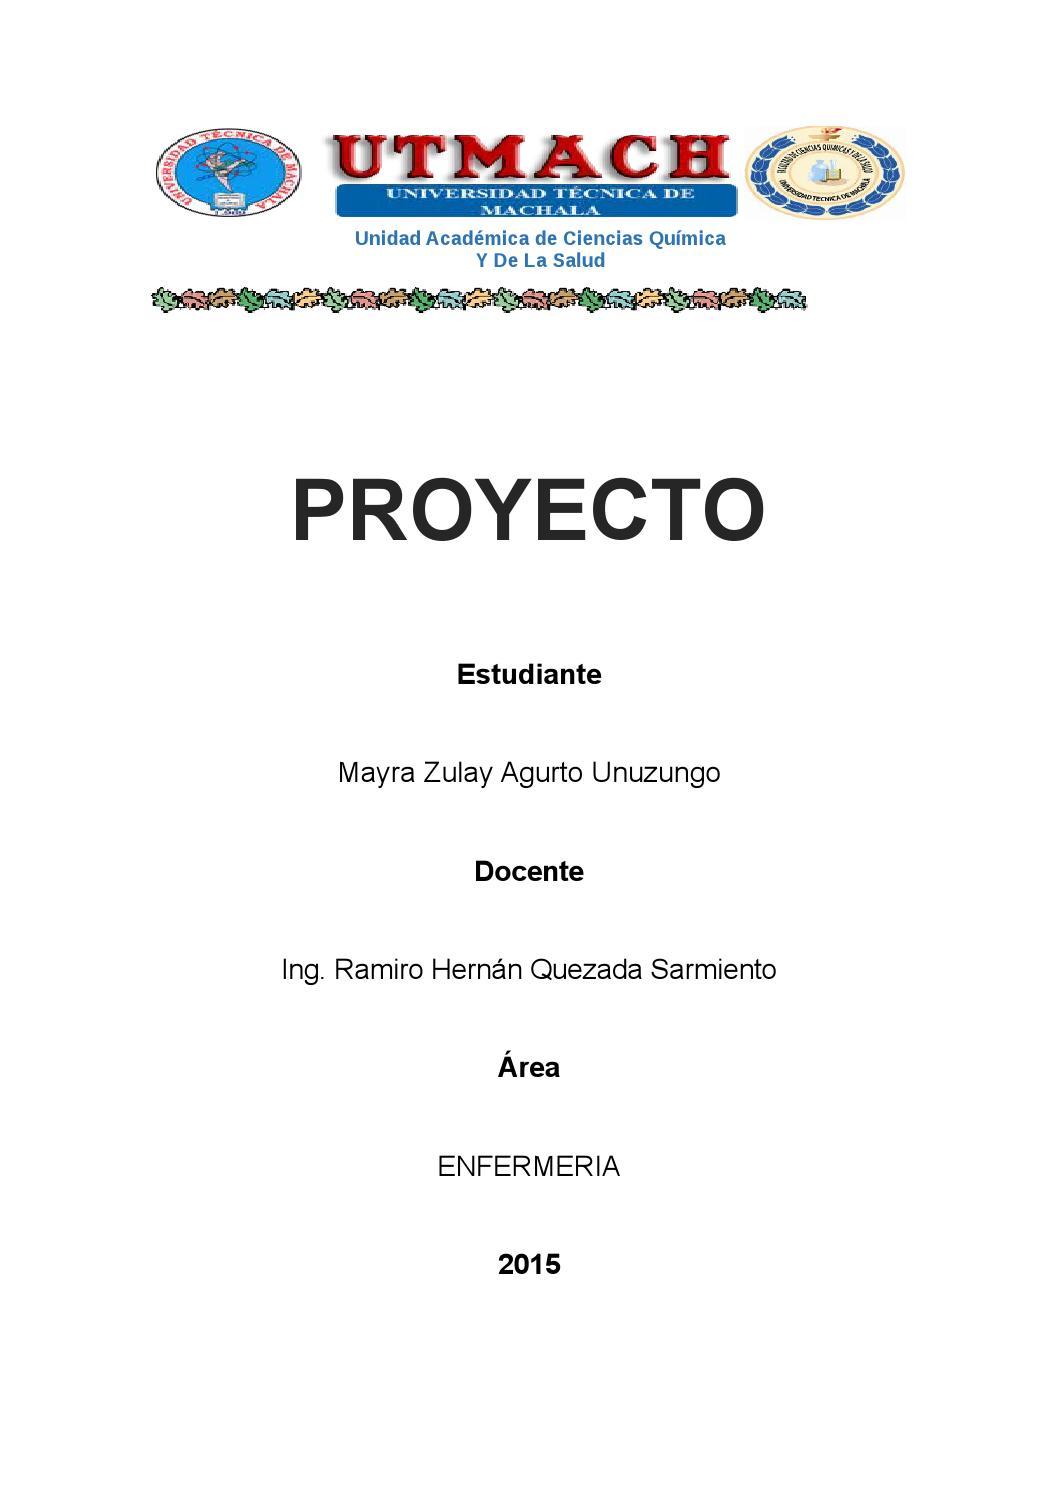 Proyecto huasipungo by Mayra Zulay Agurto Unuzungo - issuu